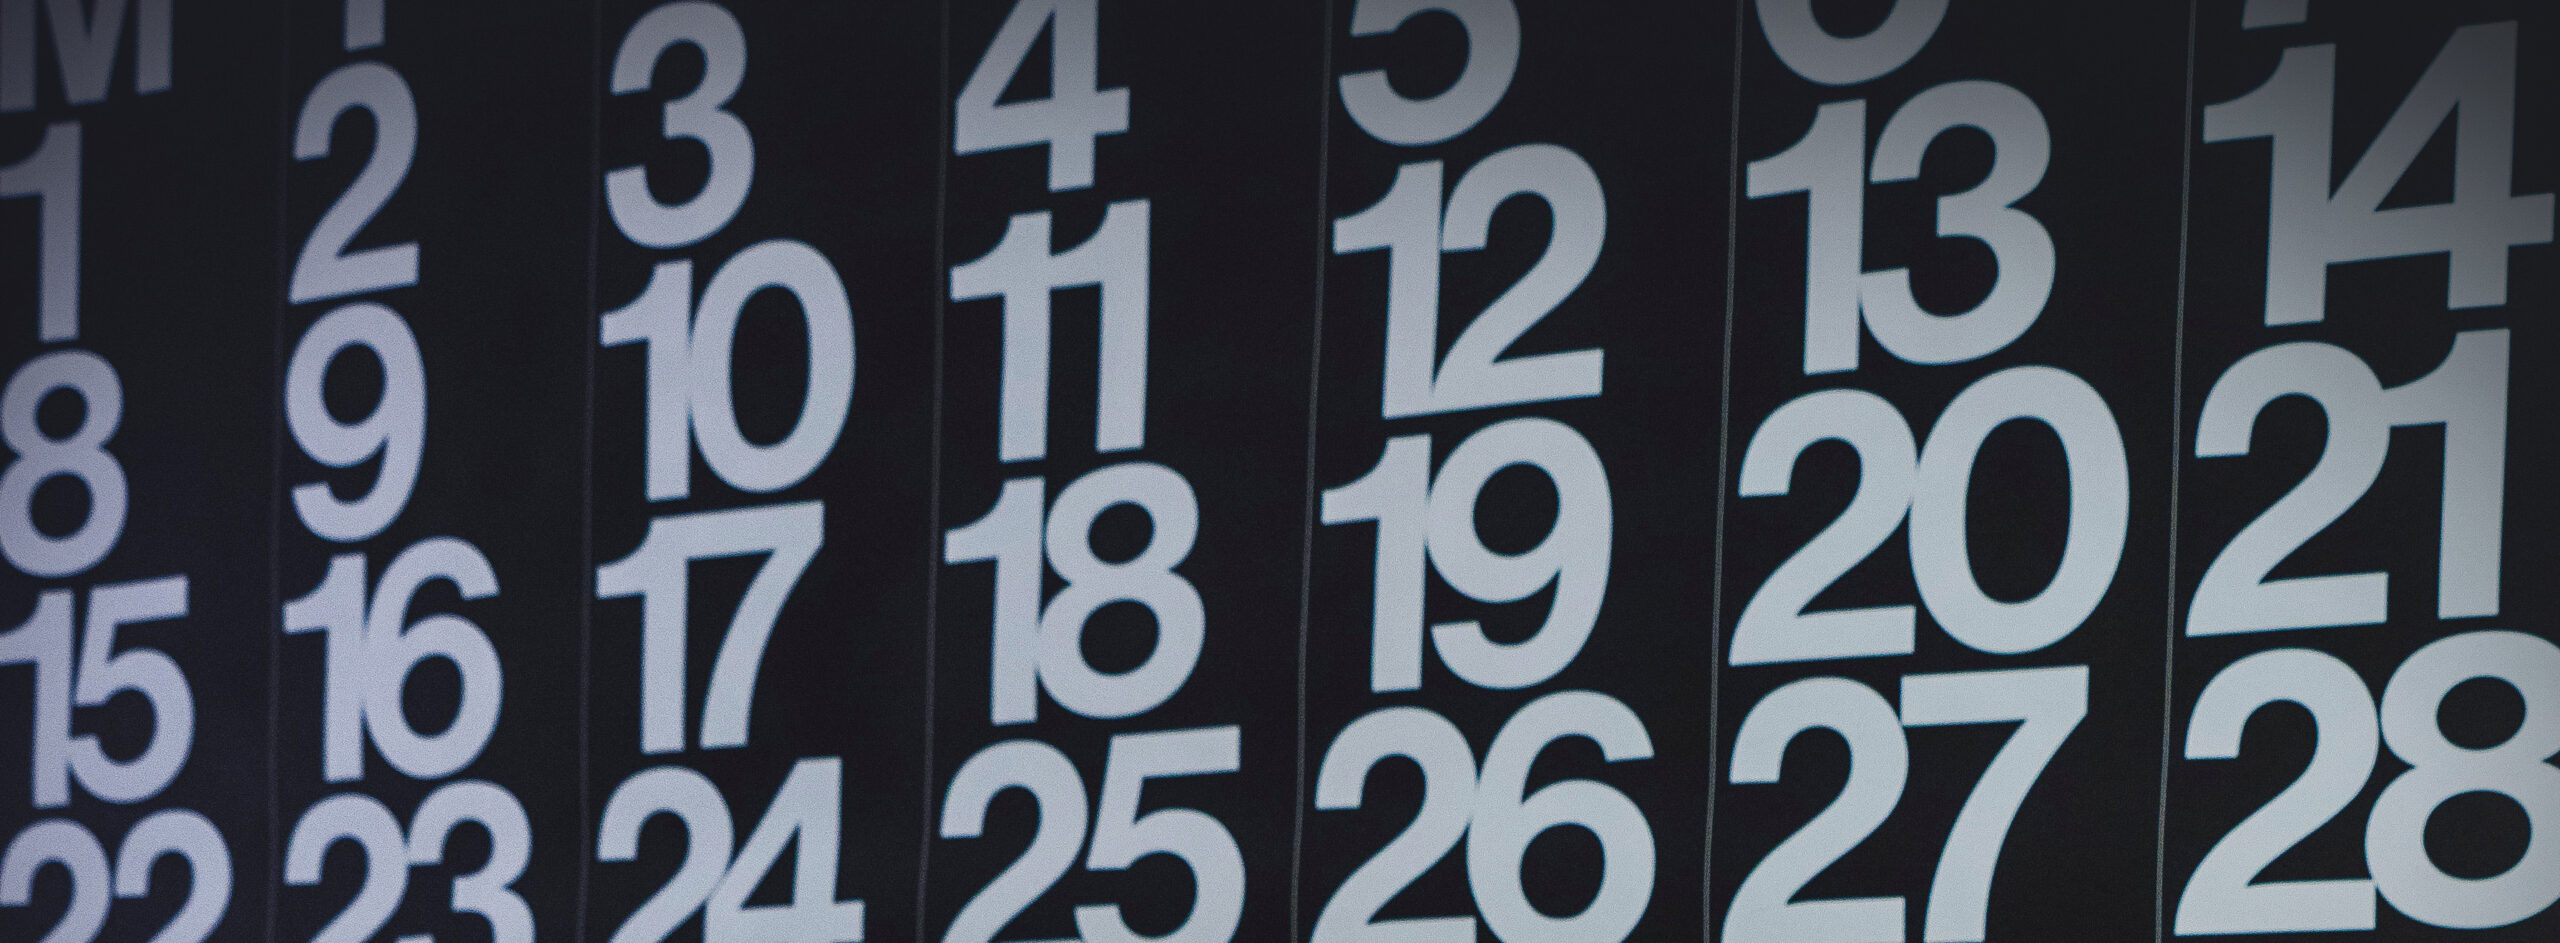 kalender_3